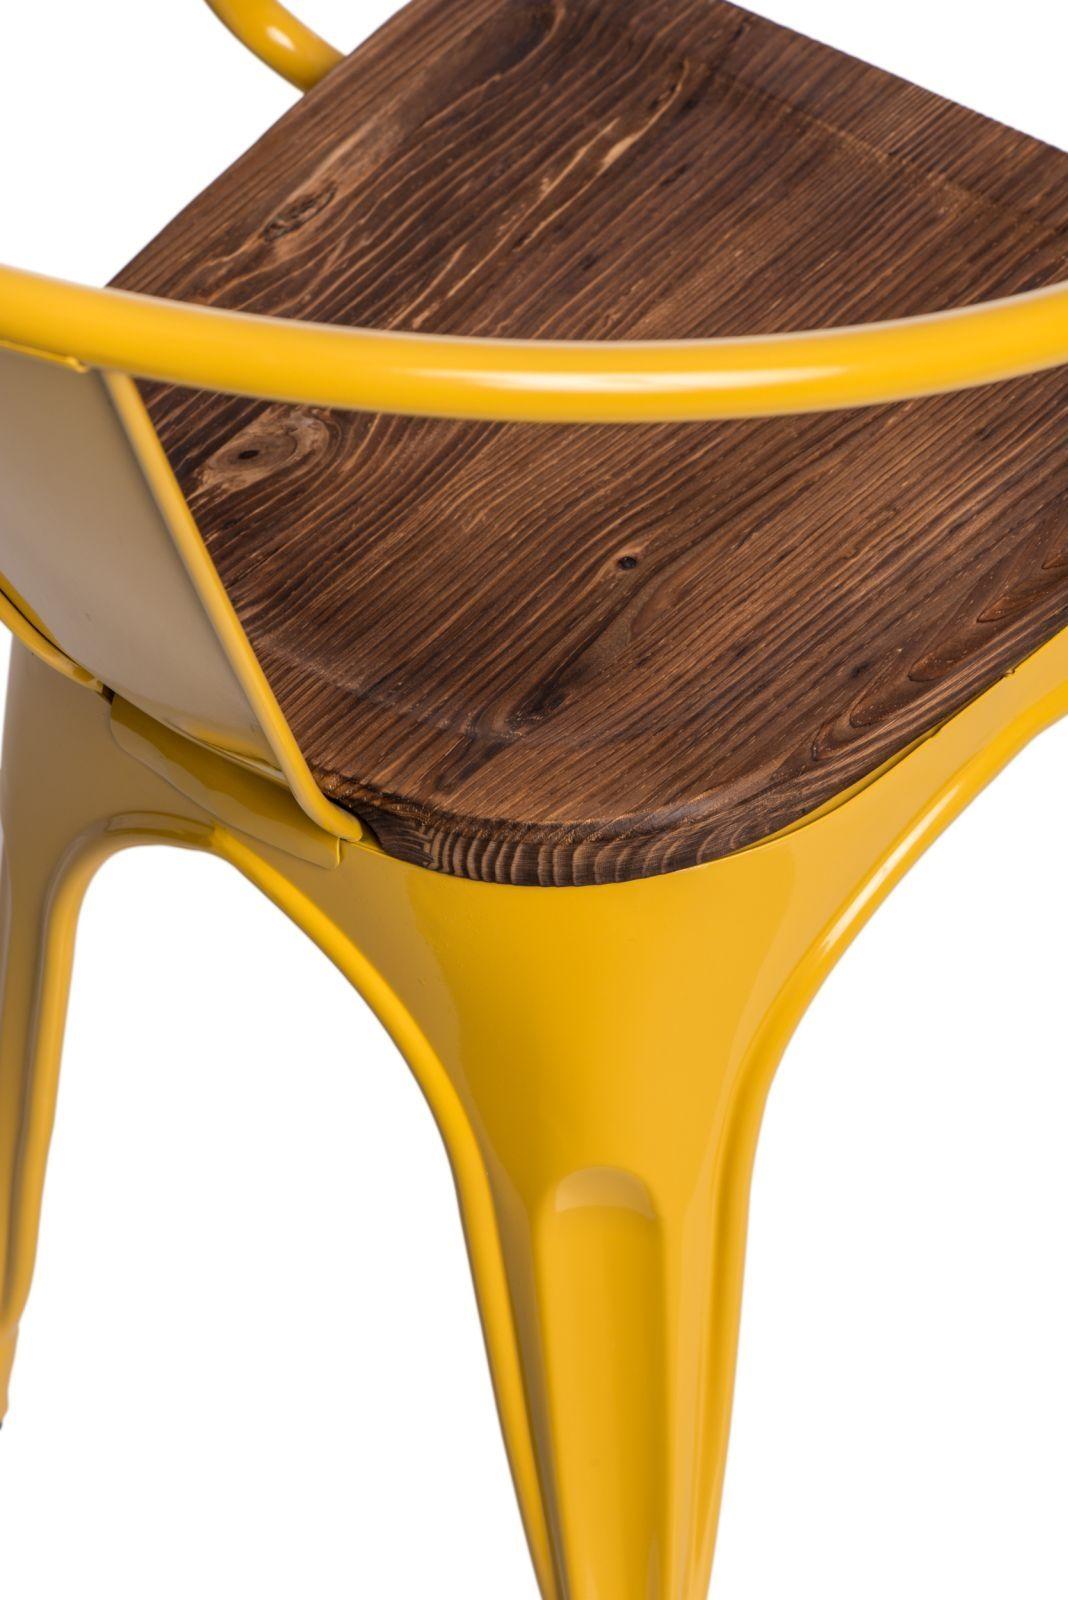 D2 Krzesło Paris Arms Wood żółty sosna